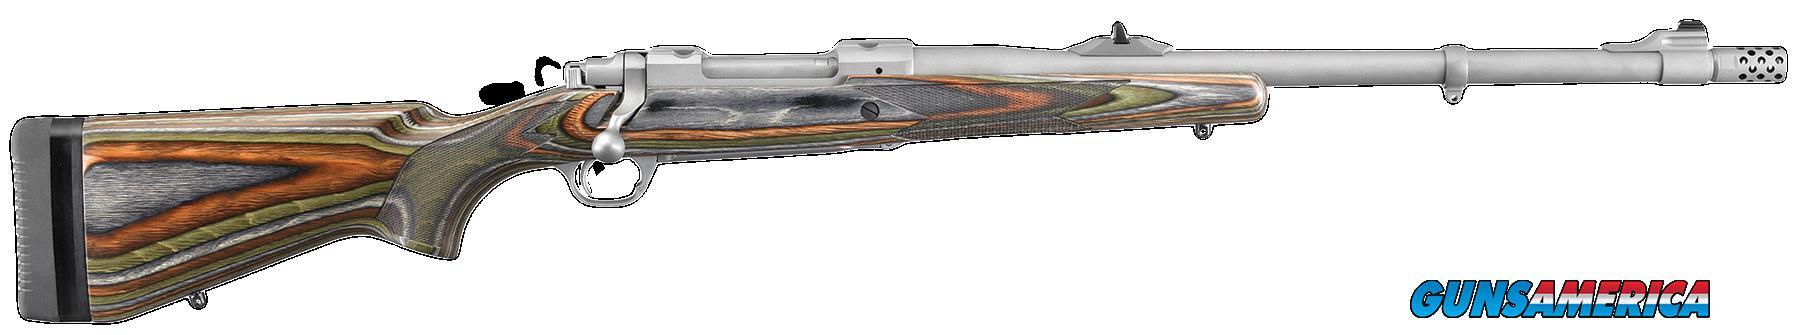 Ruger Guide Gun, Rug 47118 Guide            3006            Ss  Guns > Pistols > 1911 Pistol Copies (non-Colt)